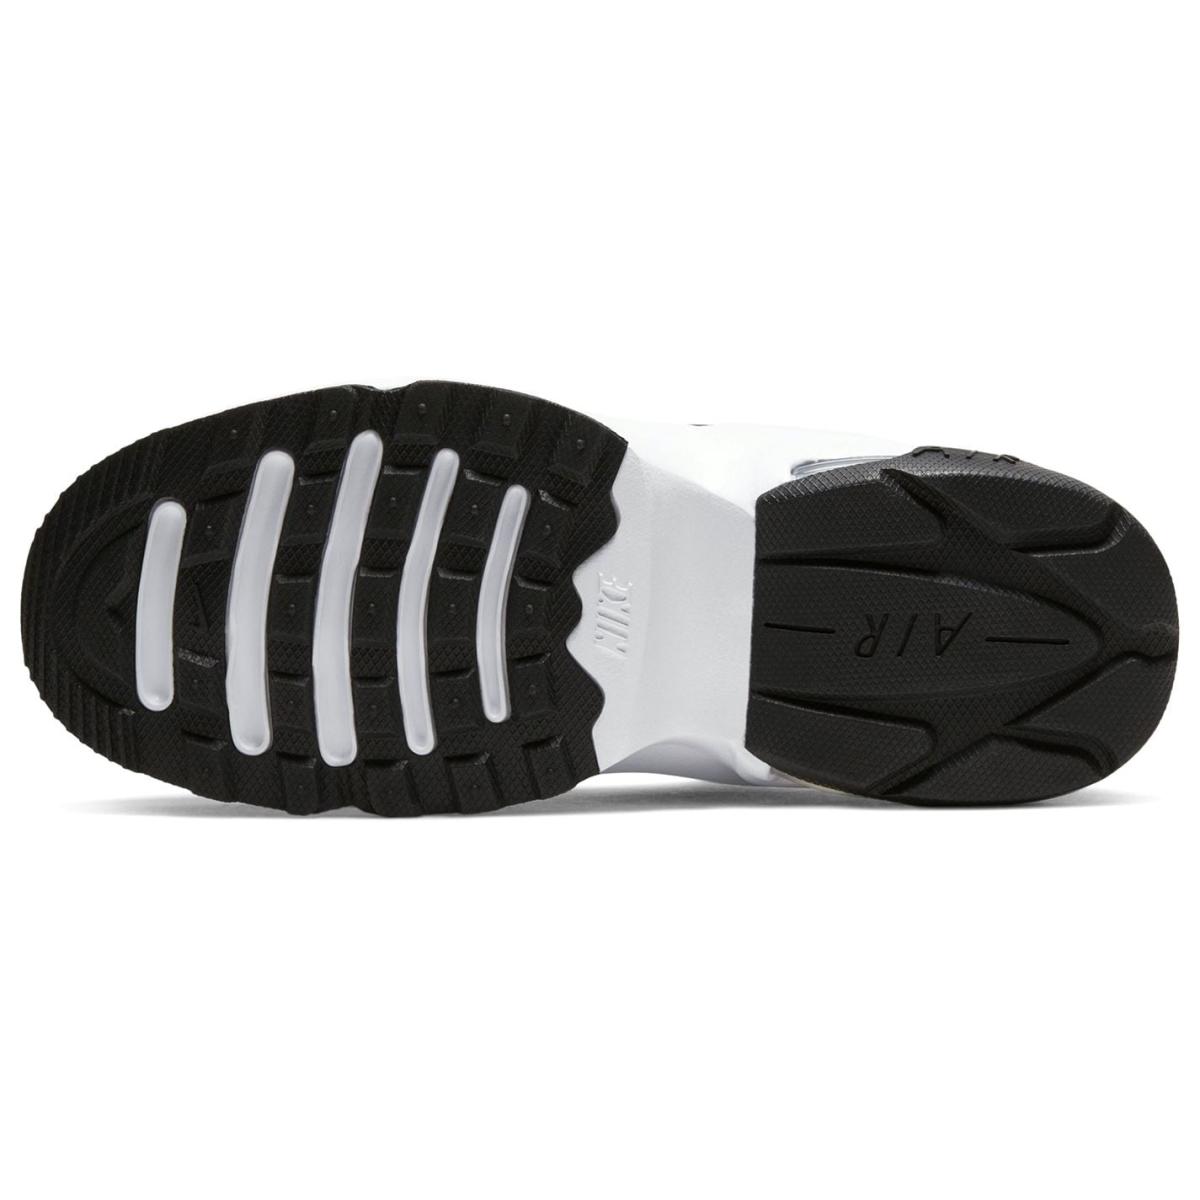 Nike-Air-Max-Graviton-Turnschuhe-Damen-Sneaker-Sportschuhe-Laufschuhe-4069 Indexbild 6